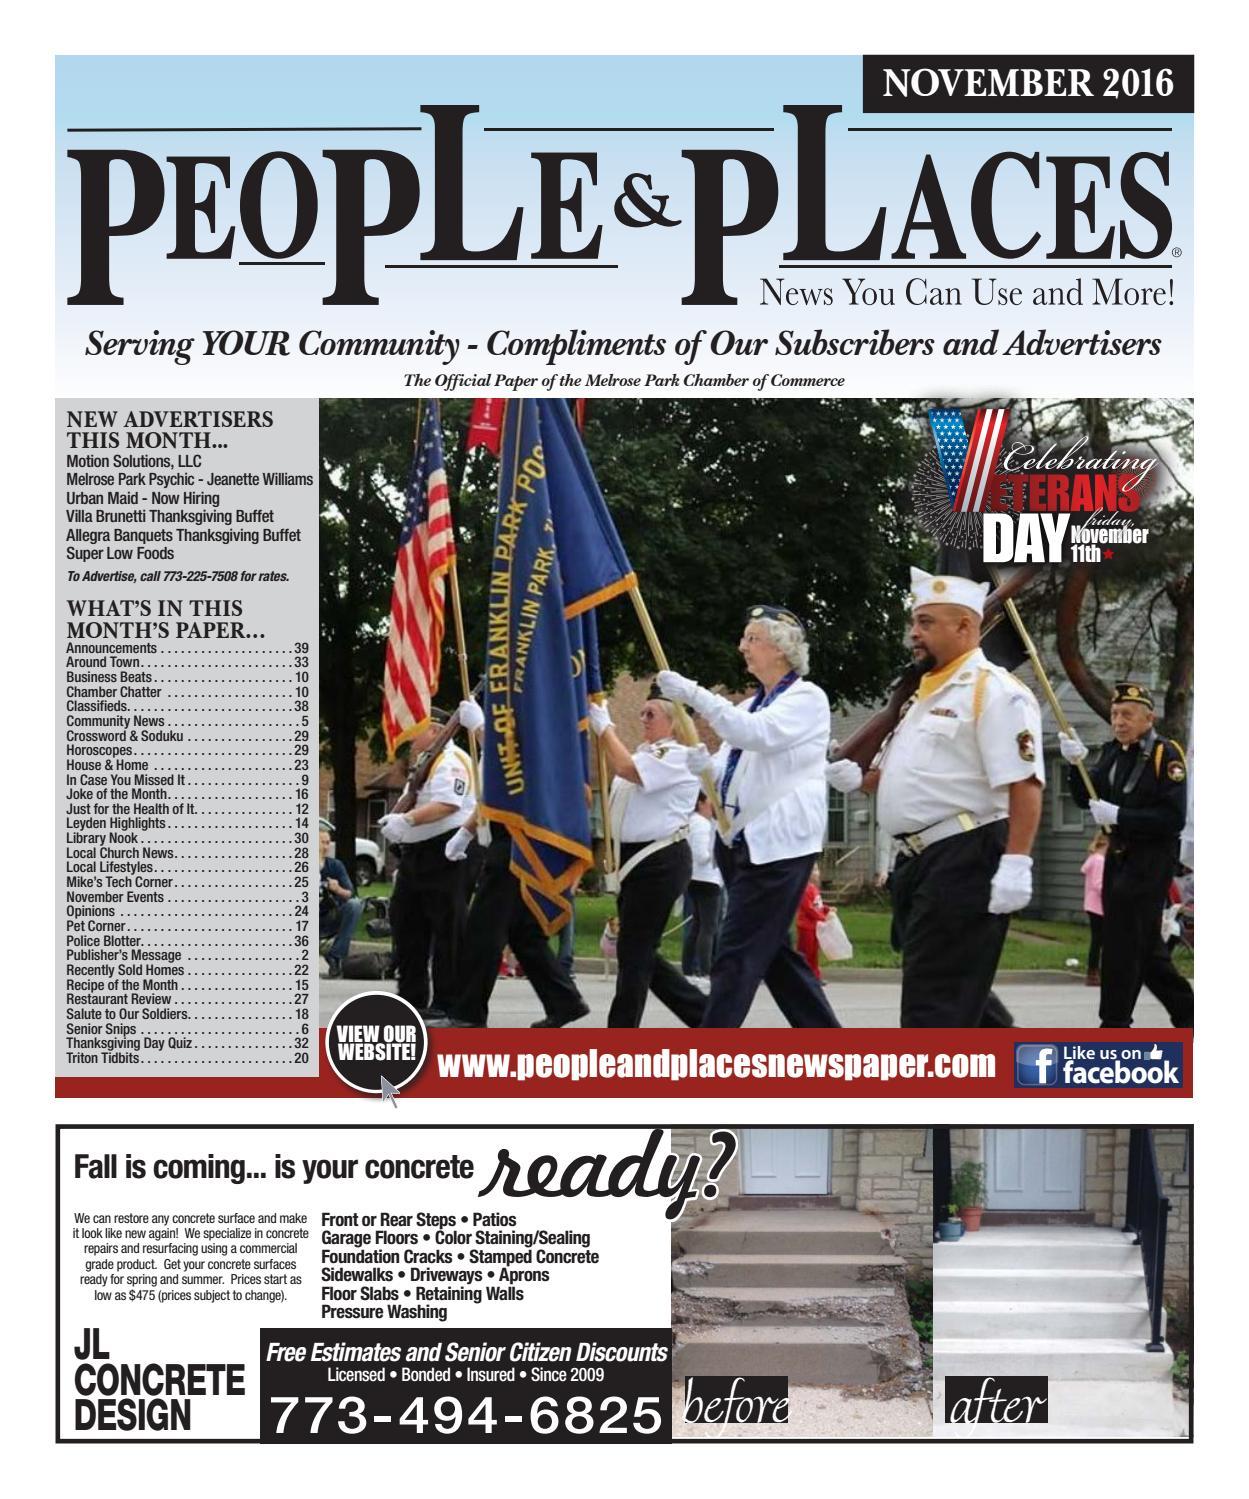 November 2016 People & Places Newspaper by Jennifer Creative